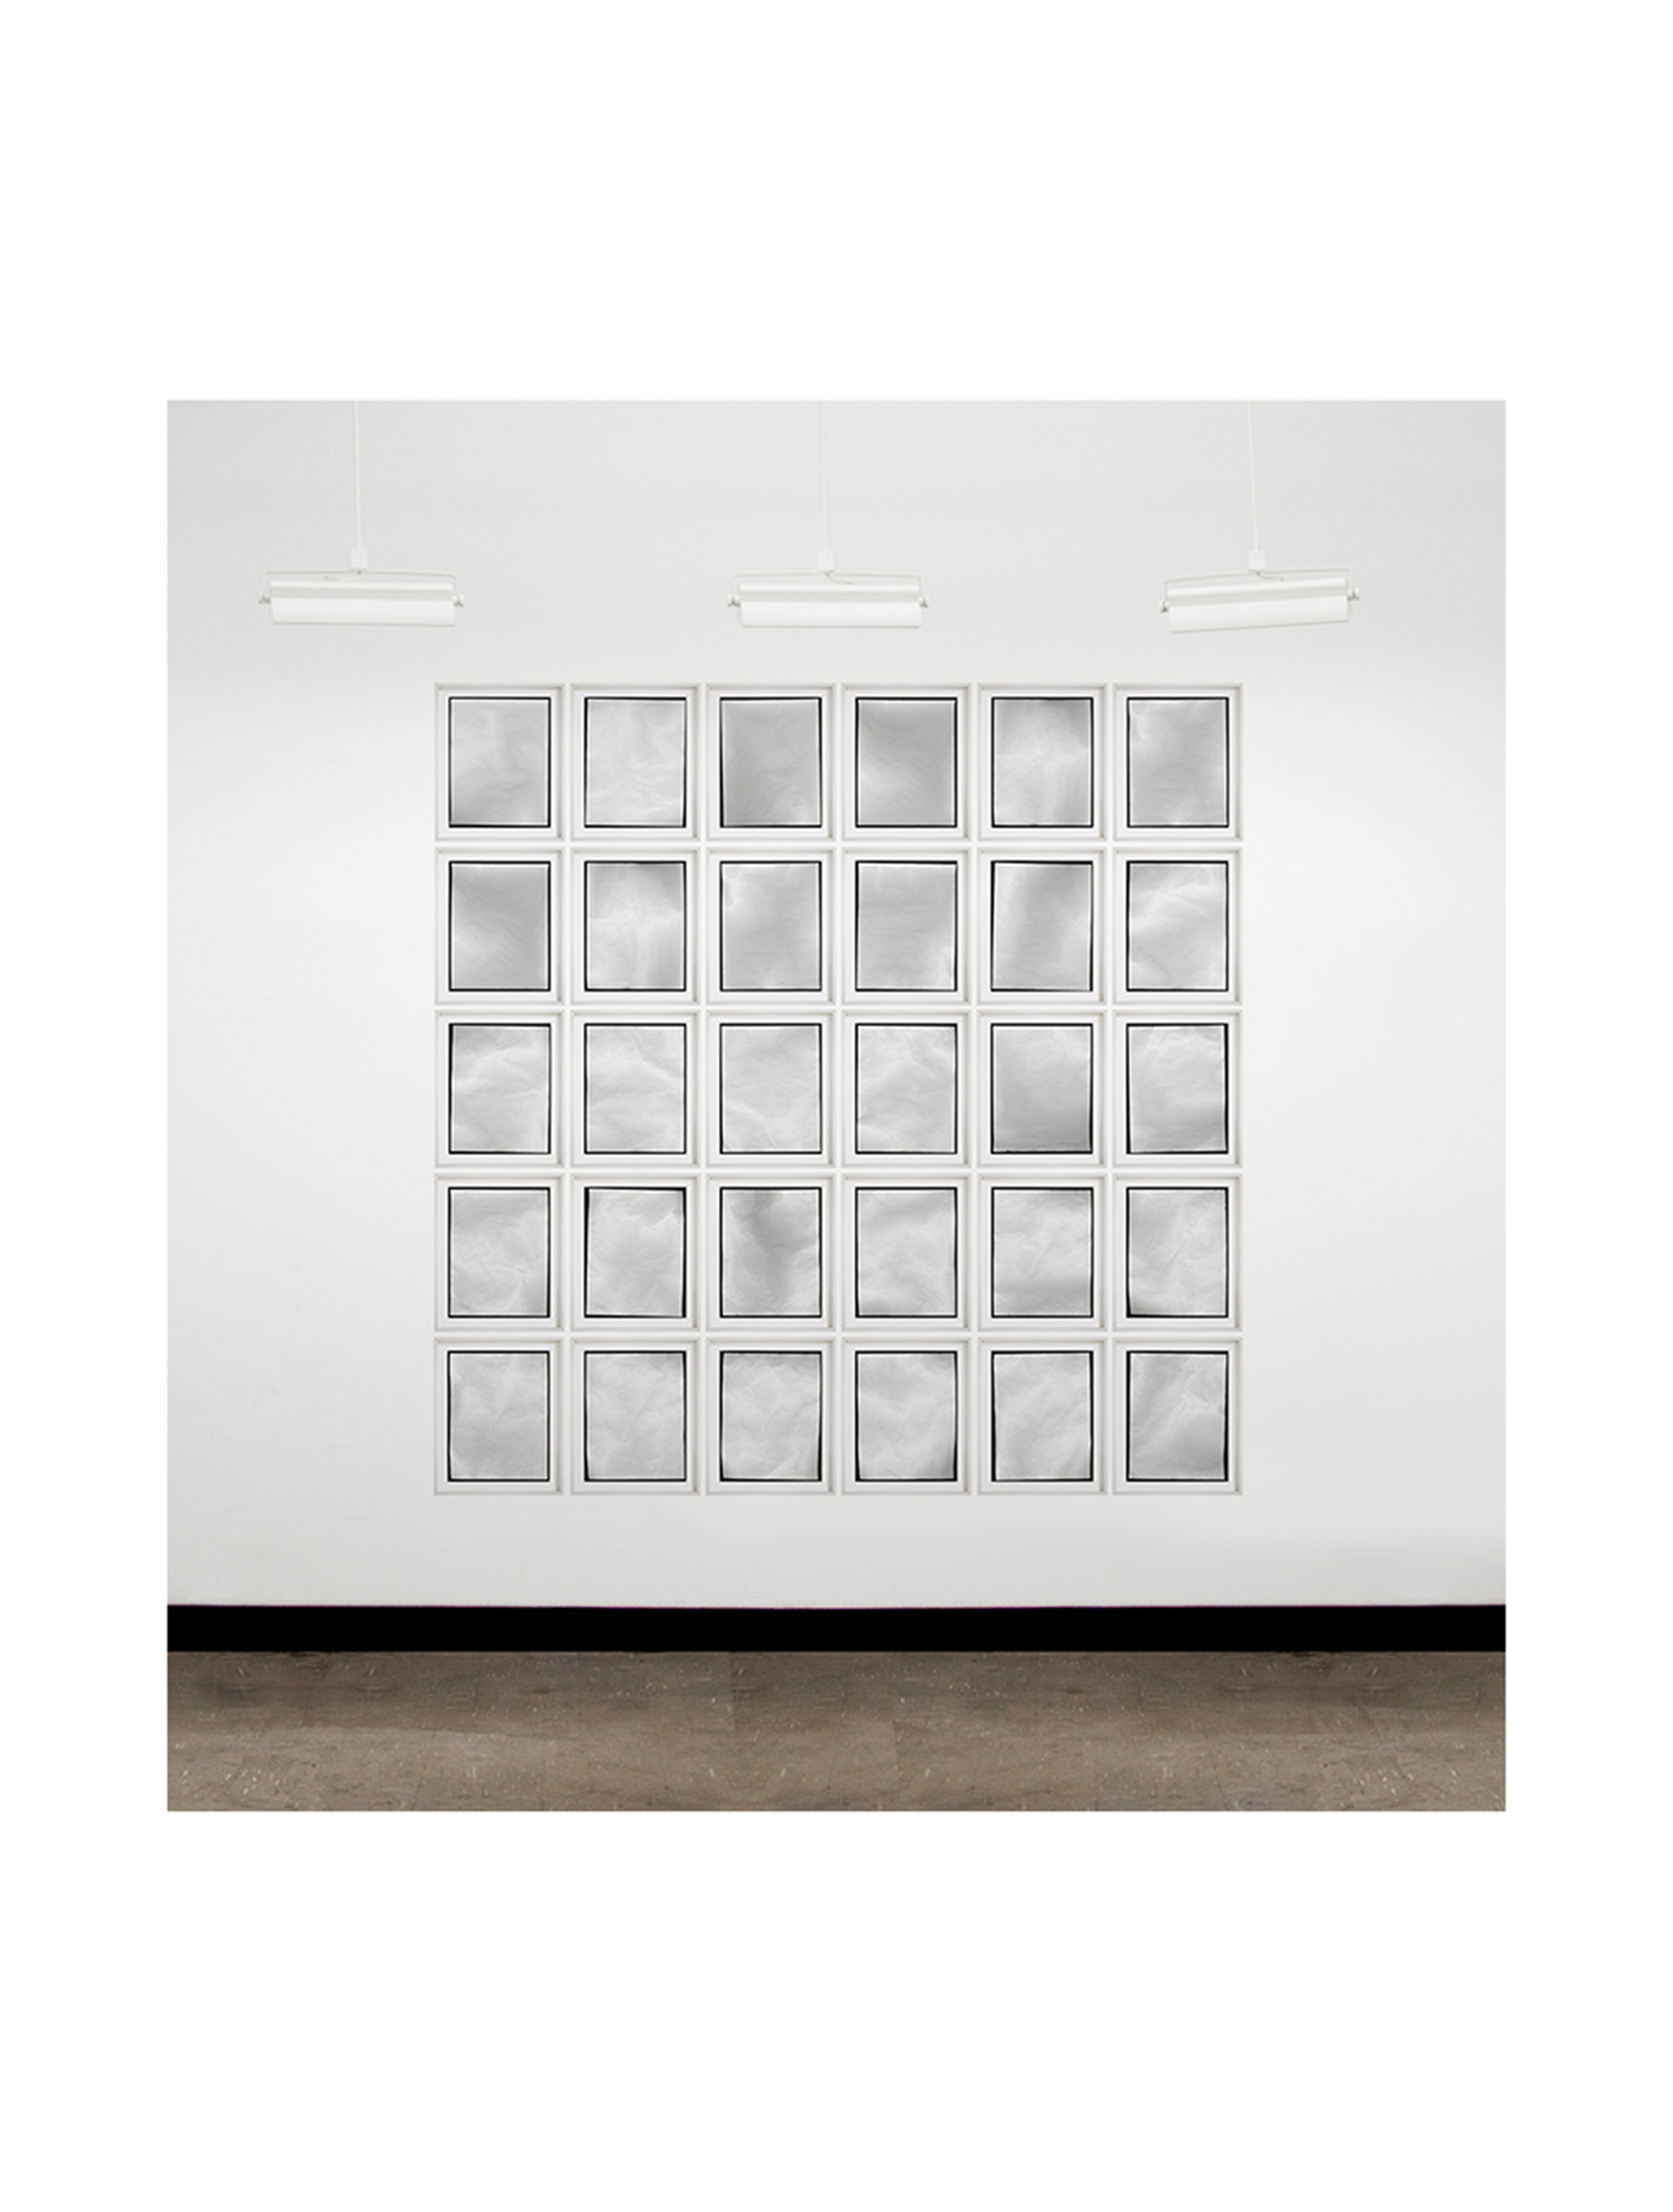 Paper_Installation_framed_cropped_size to match framed images_at300dpi.jpg